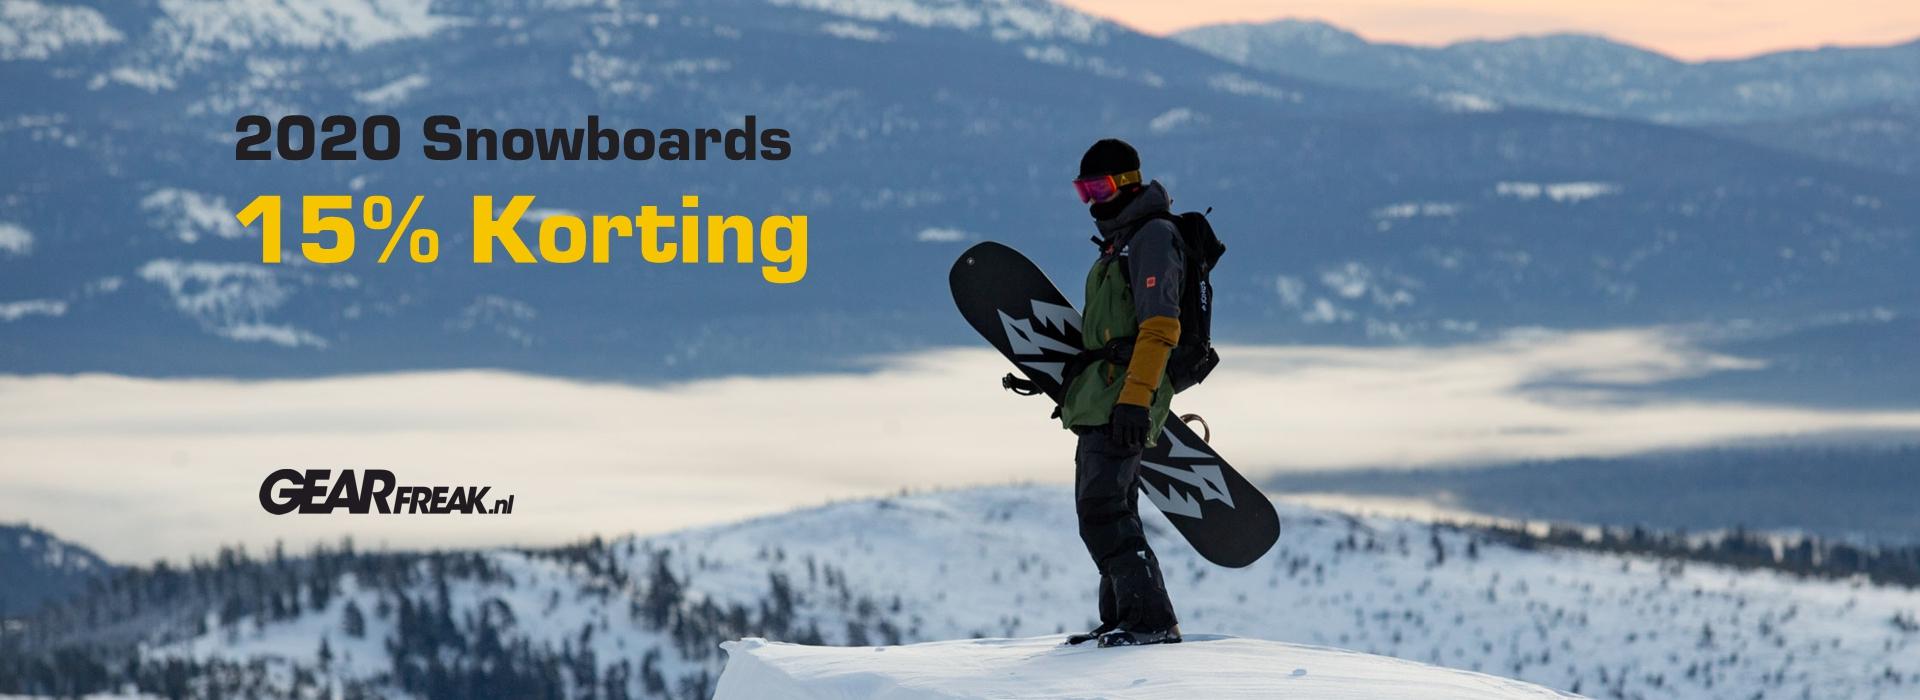 Snowboard 15%